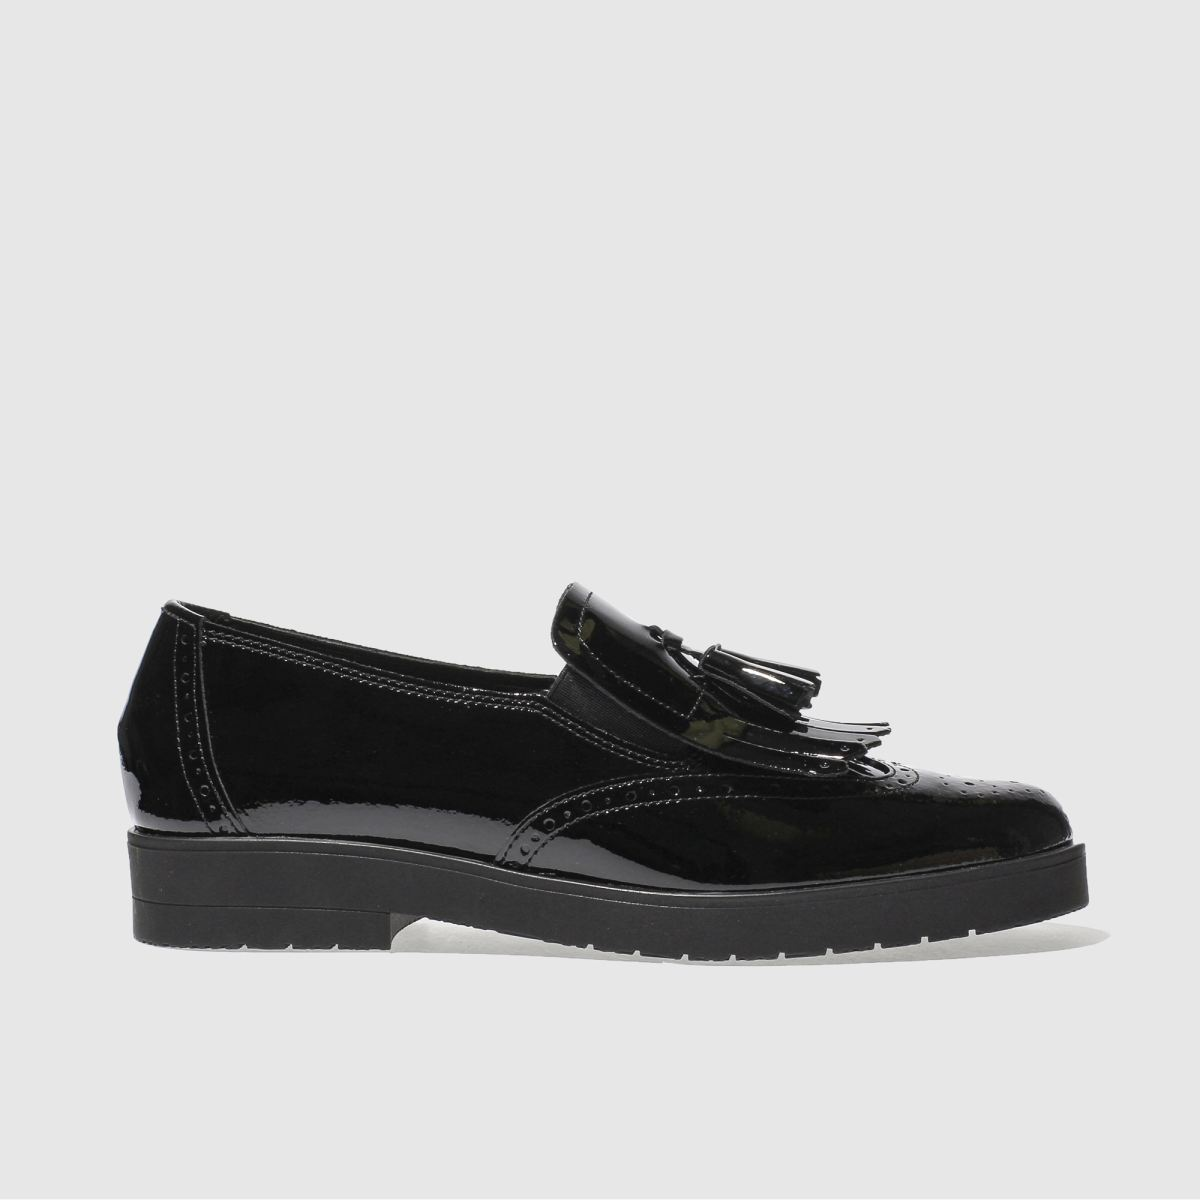 Schuh Black Hunky Dory Flat Shoes